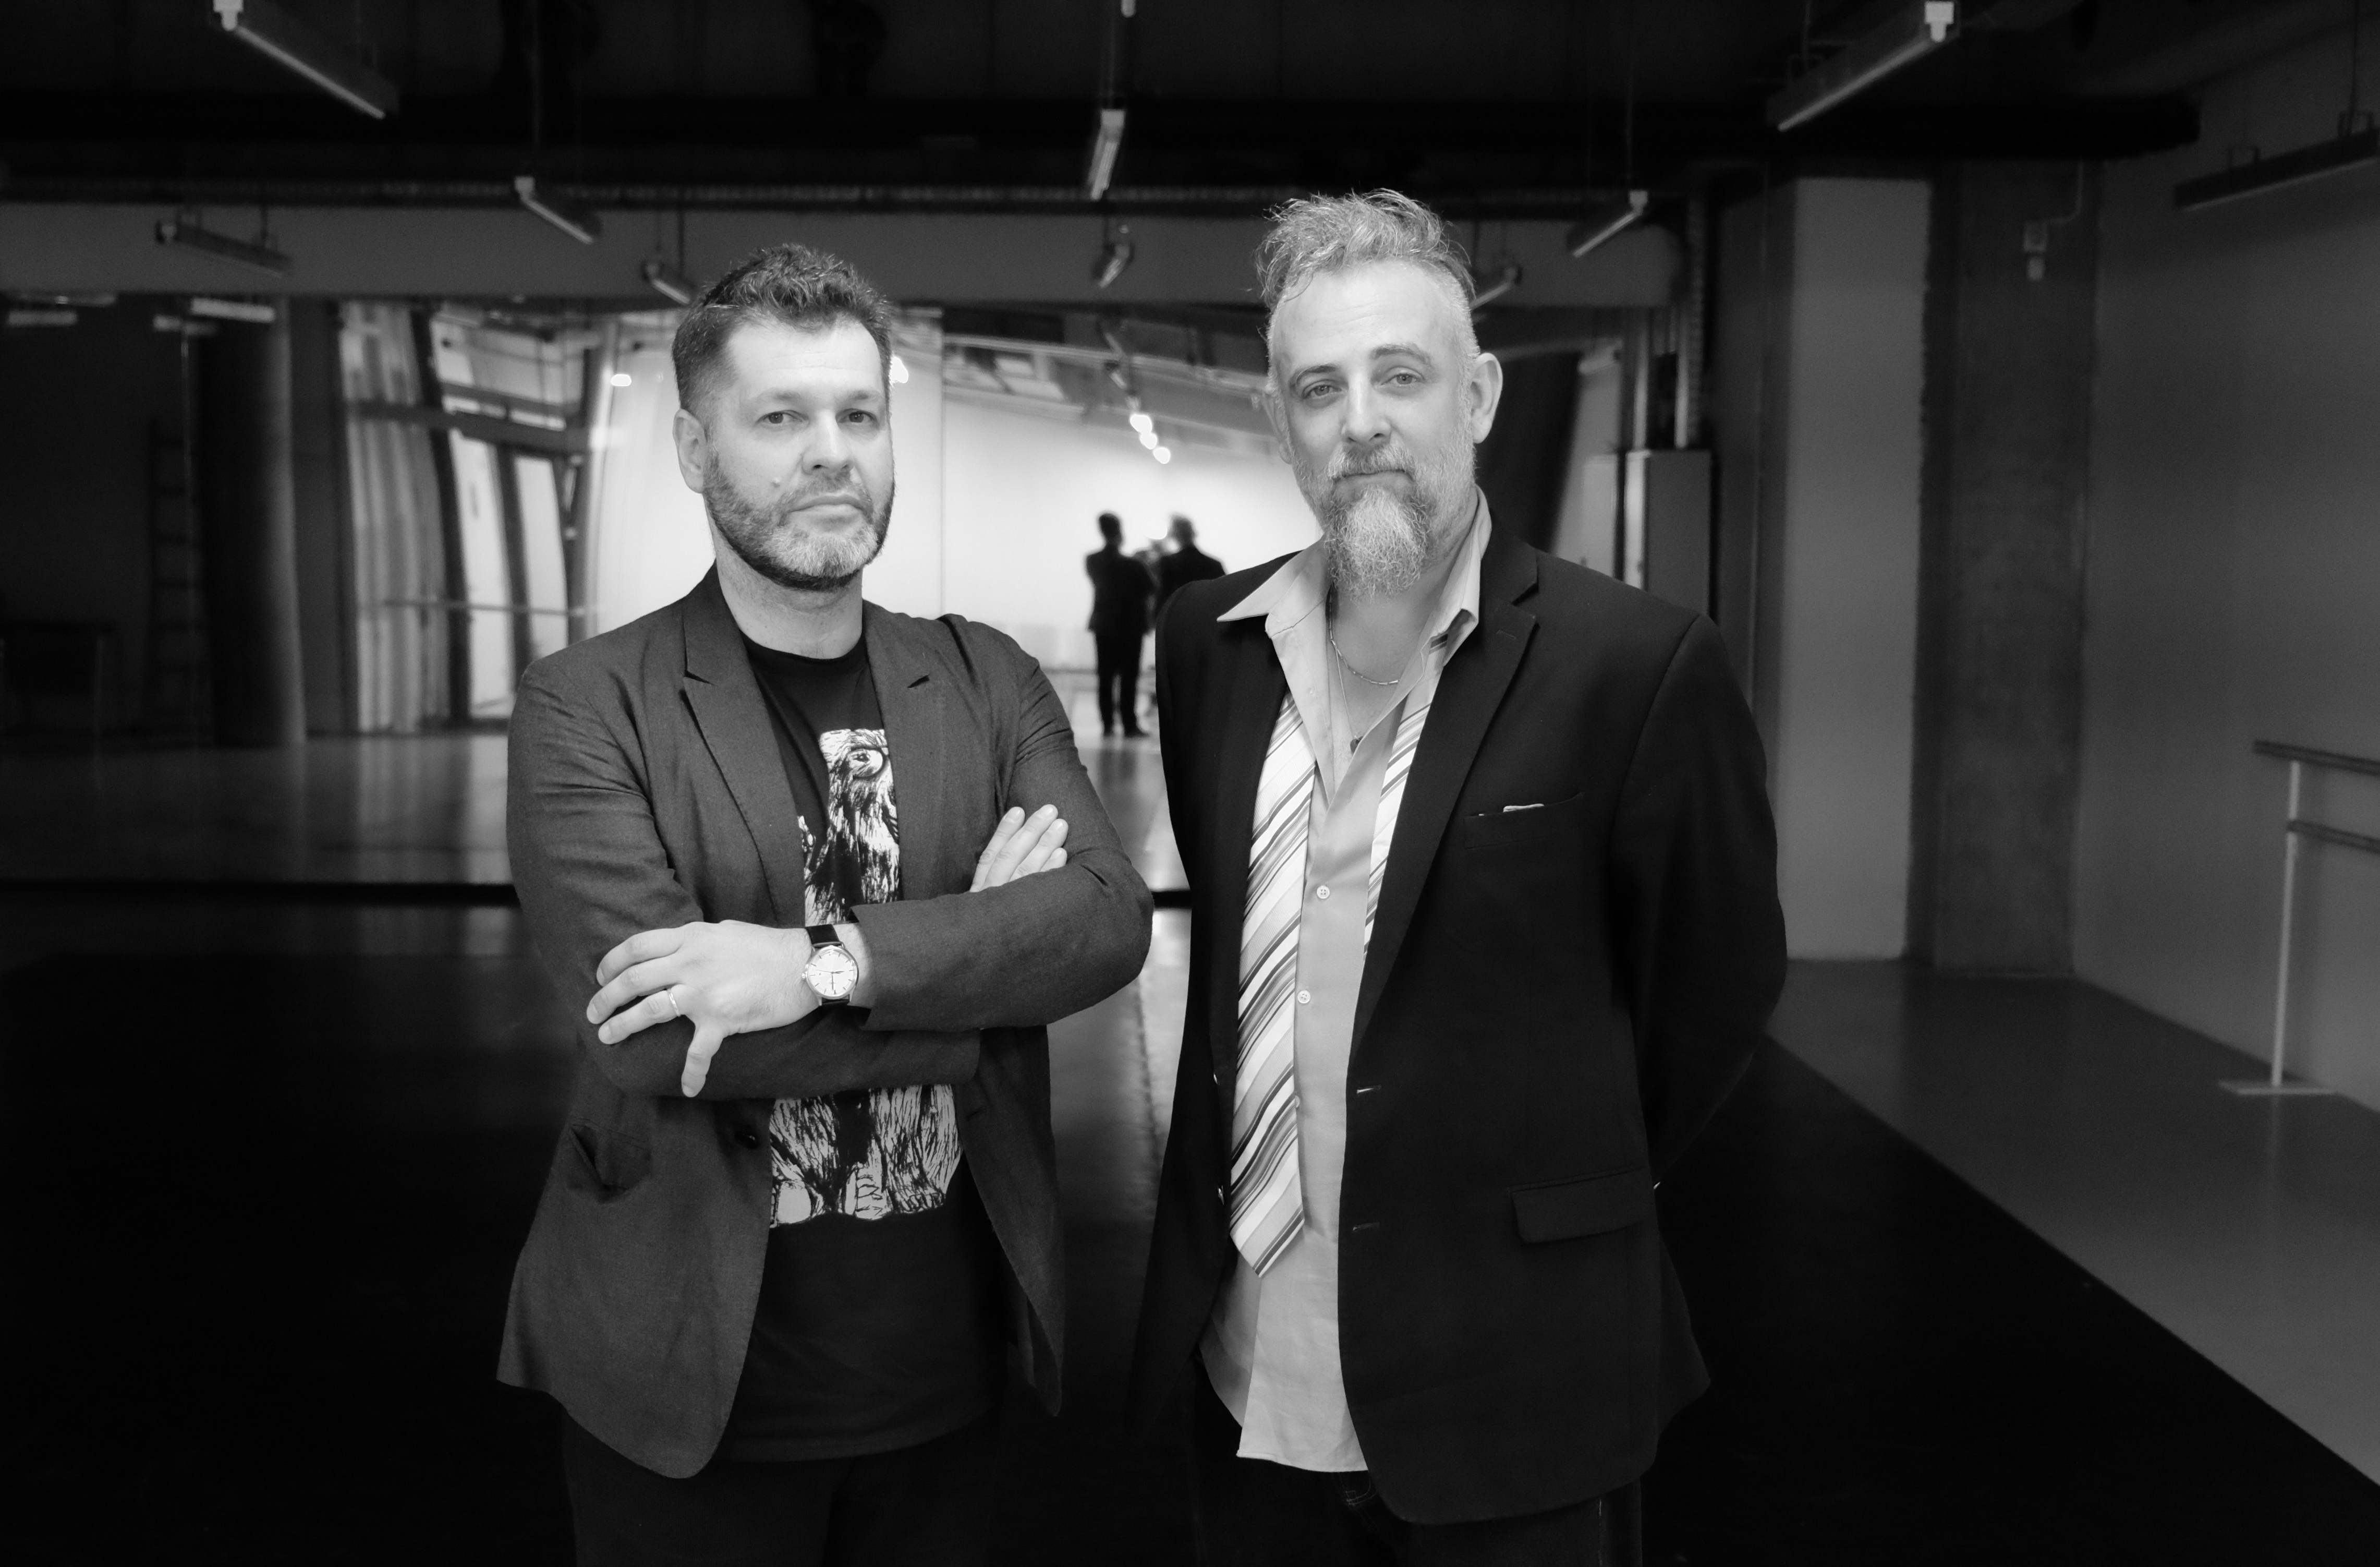 Lucian Ban și Mat Maneri. Foto: Șerban Mestecăneanu